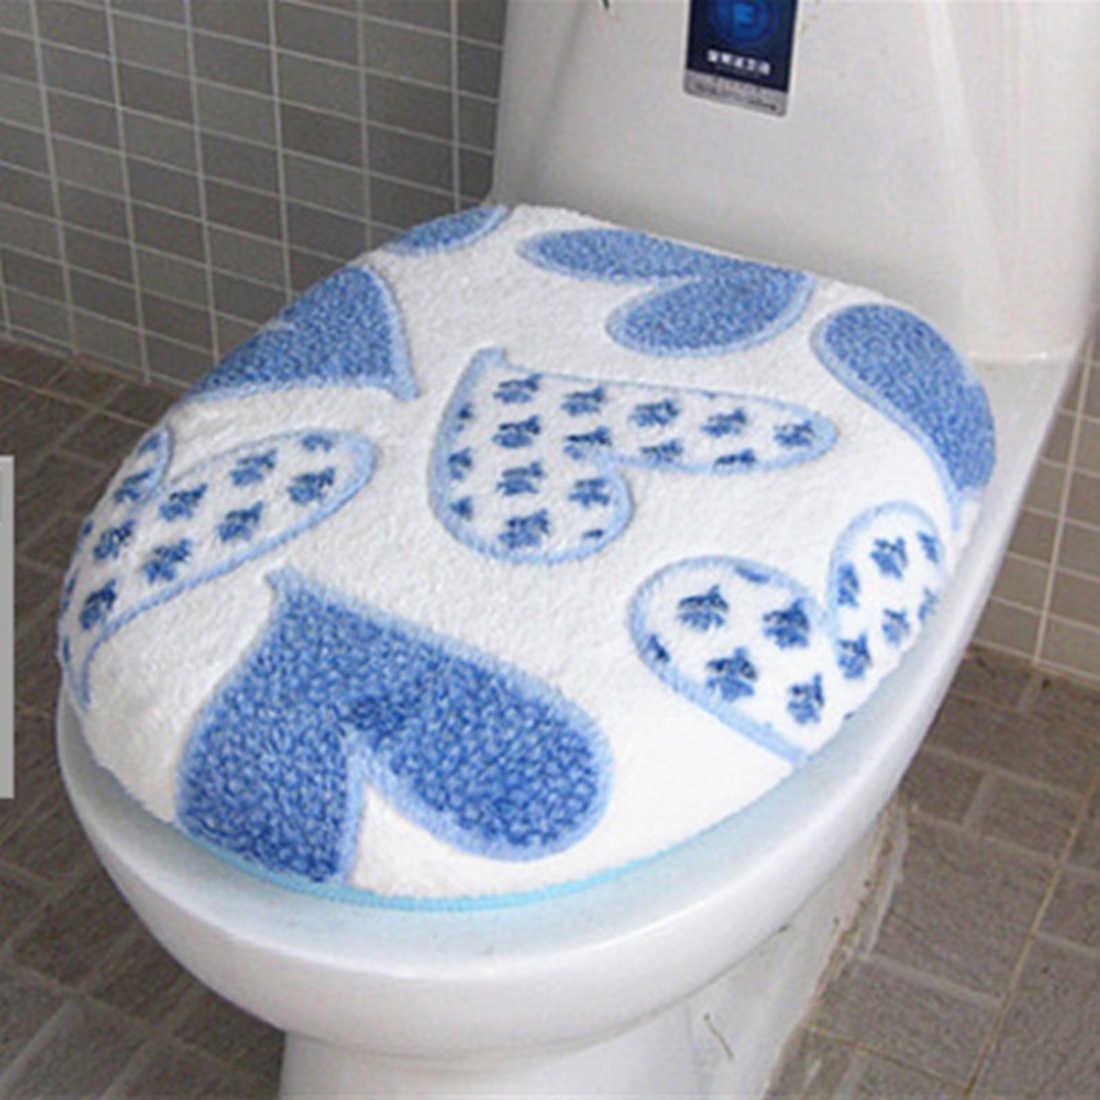 Prime Coral Velvet Luxury Toilet Seat Cover Set Soft Warm Two Piece Washable Toilet Case Bathroom Wc Cover Inzonedesignstudio Interior Chair Design Inzonedesignstudiocom